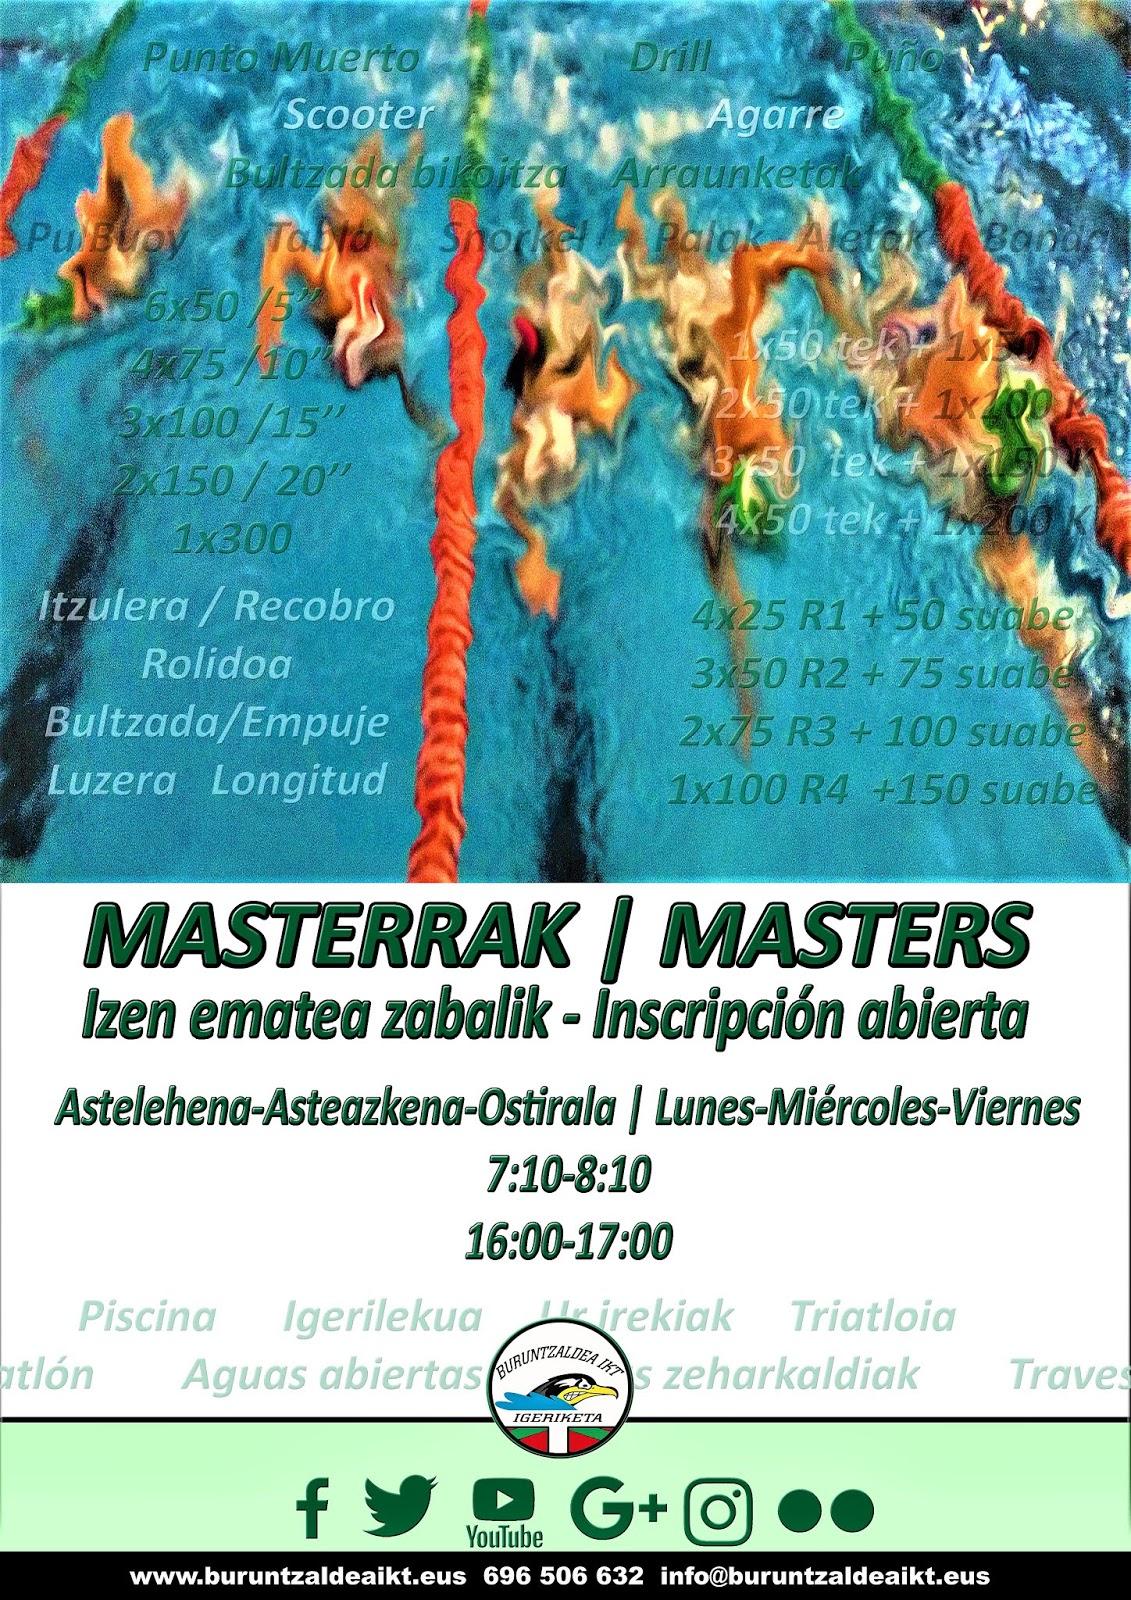 MASTERRAK | MASTERS